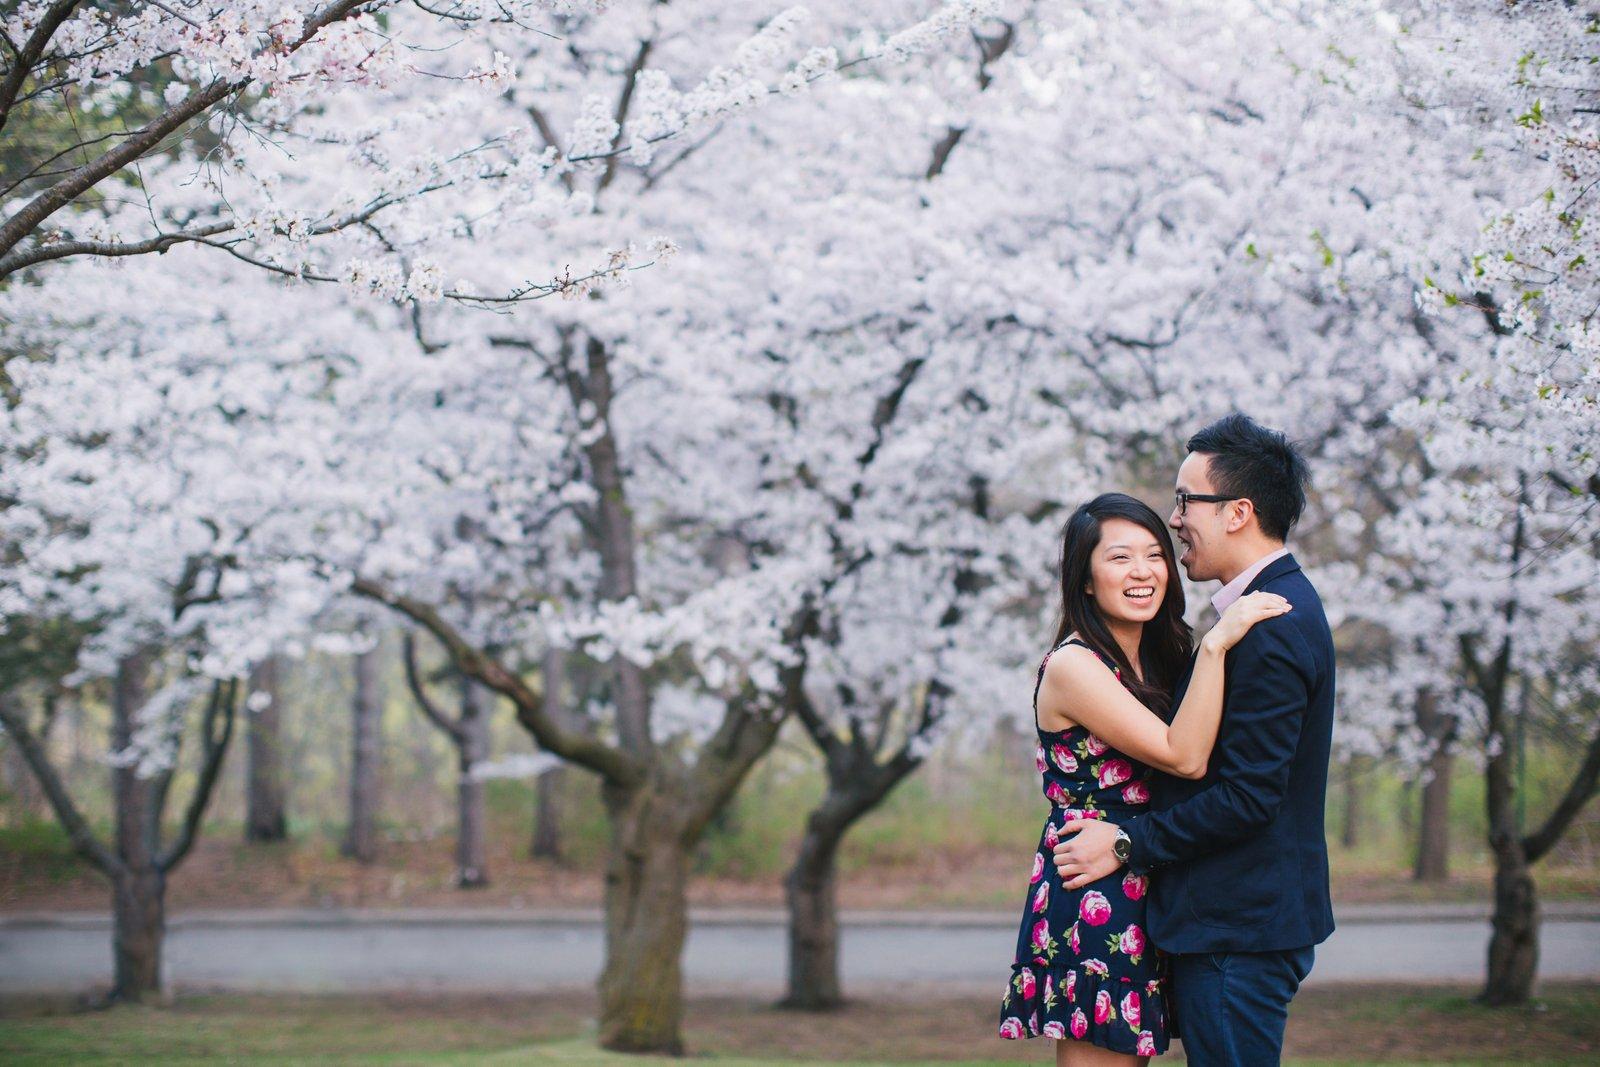 Jessica-Charles-Engagement-High-Park-Cherry-Blossom-010